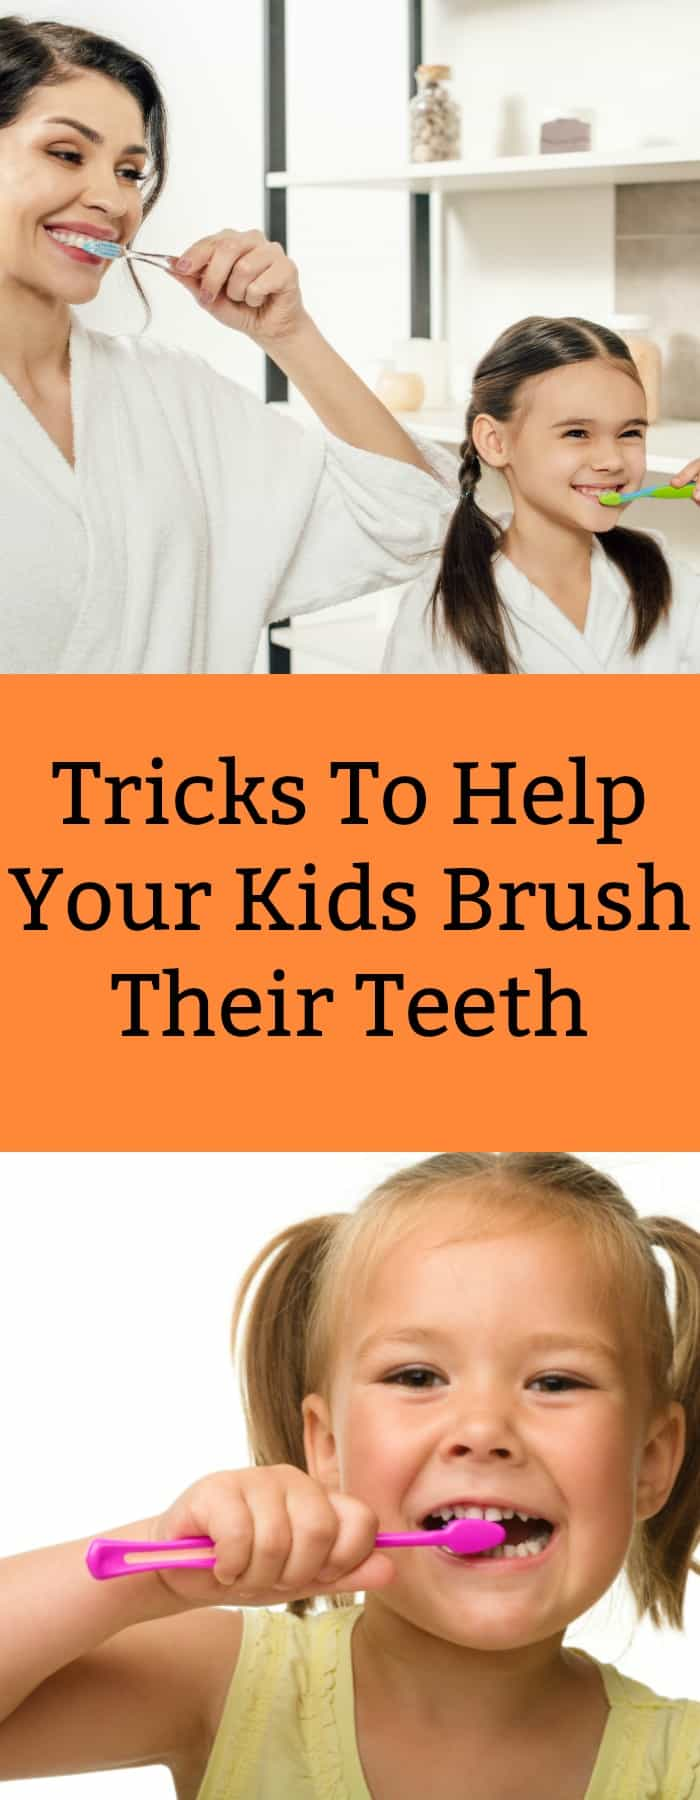 Tricks to Help Your Kids Brush Their Teeth